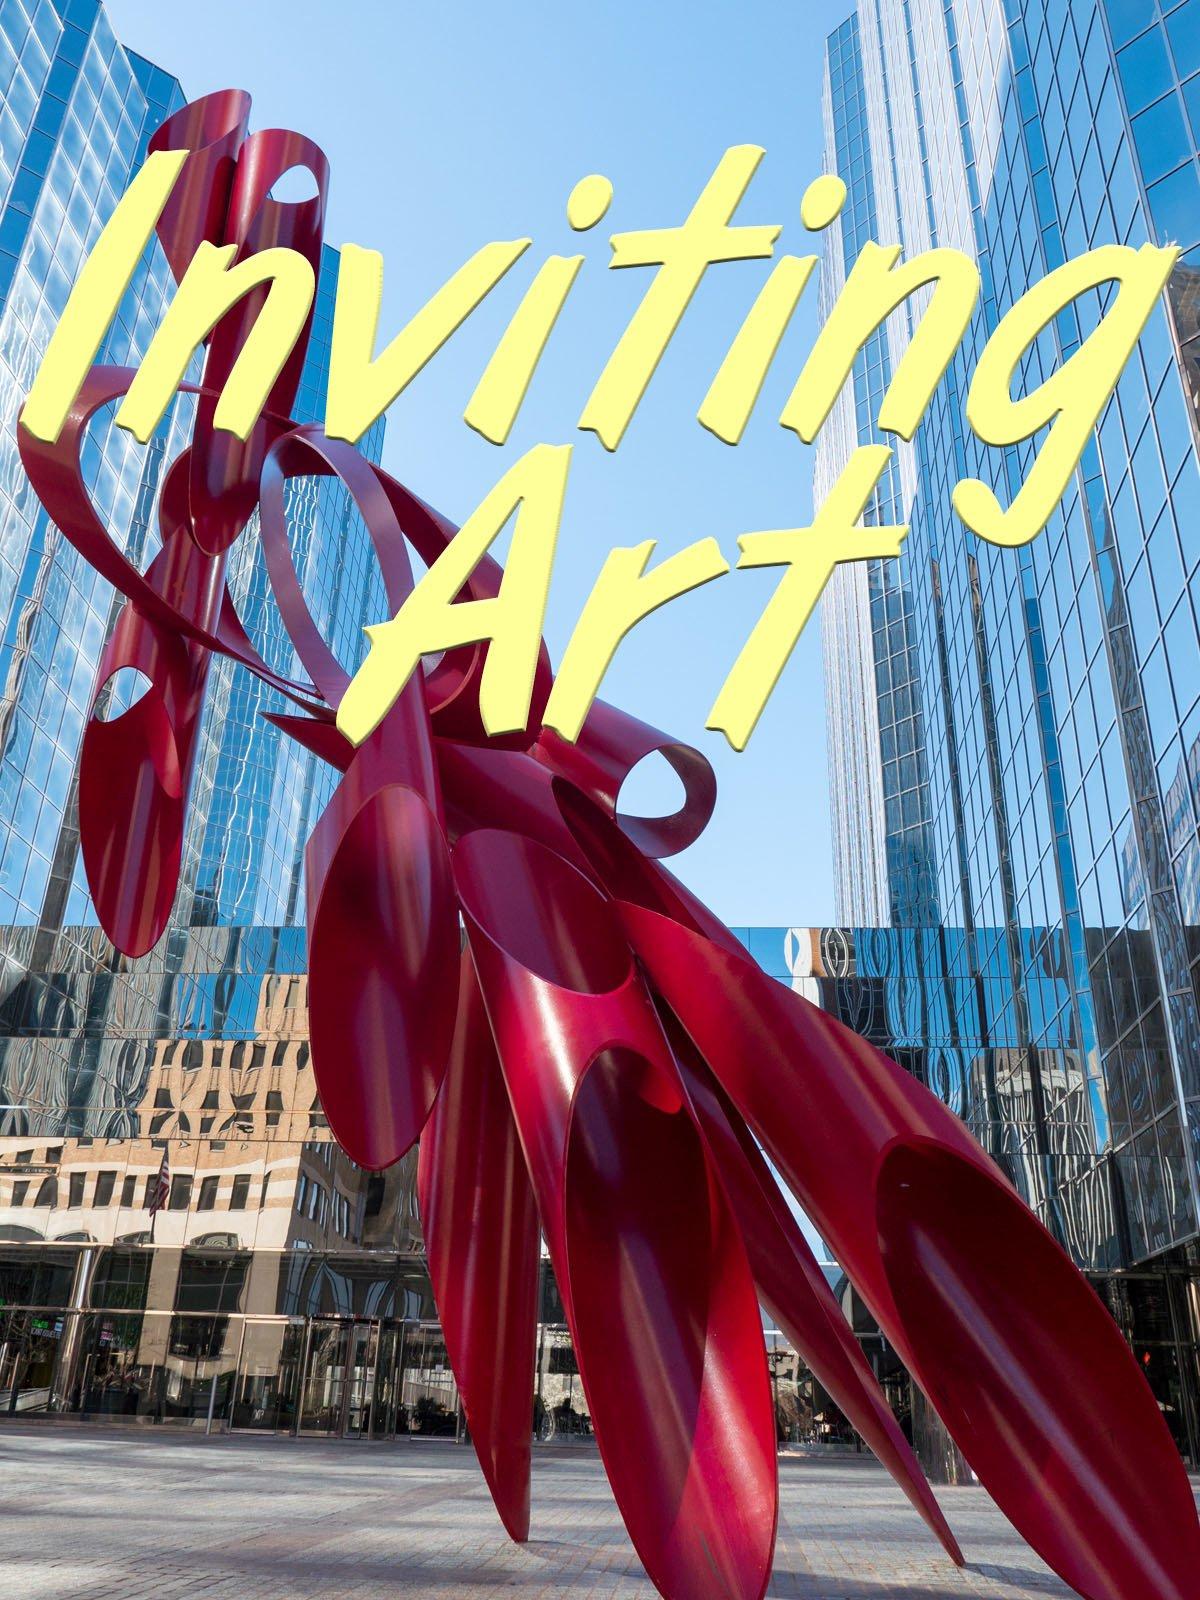 Inviting Art